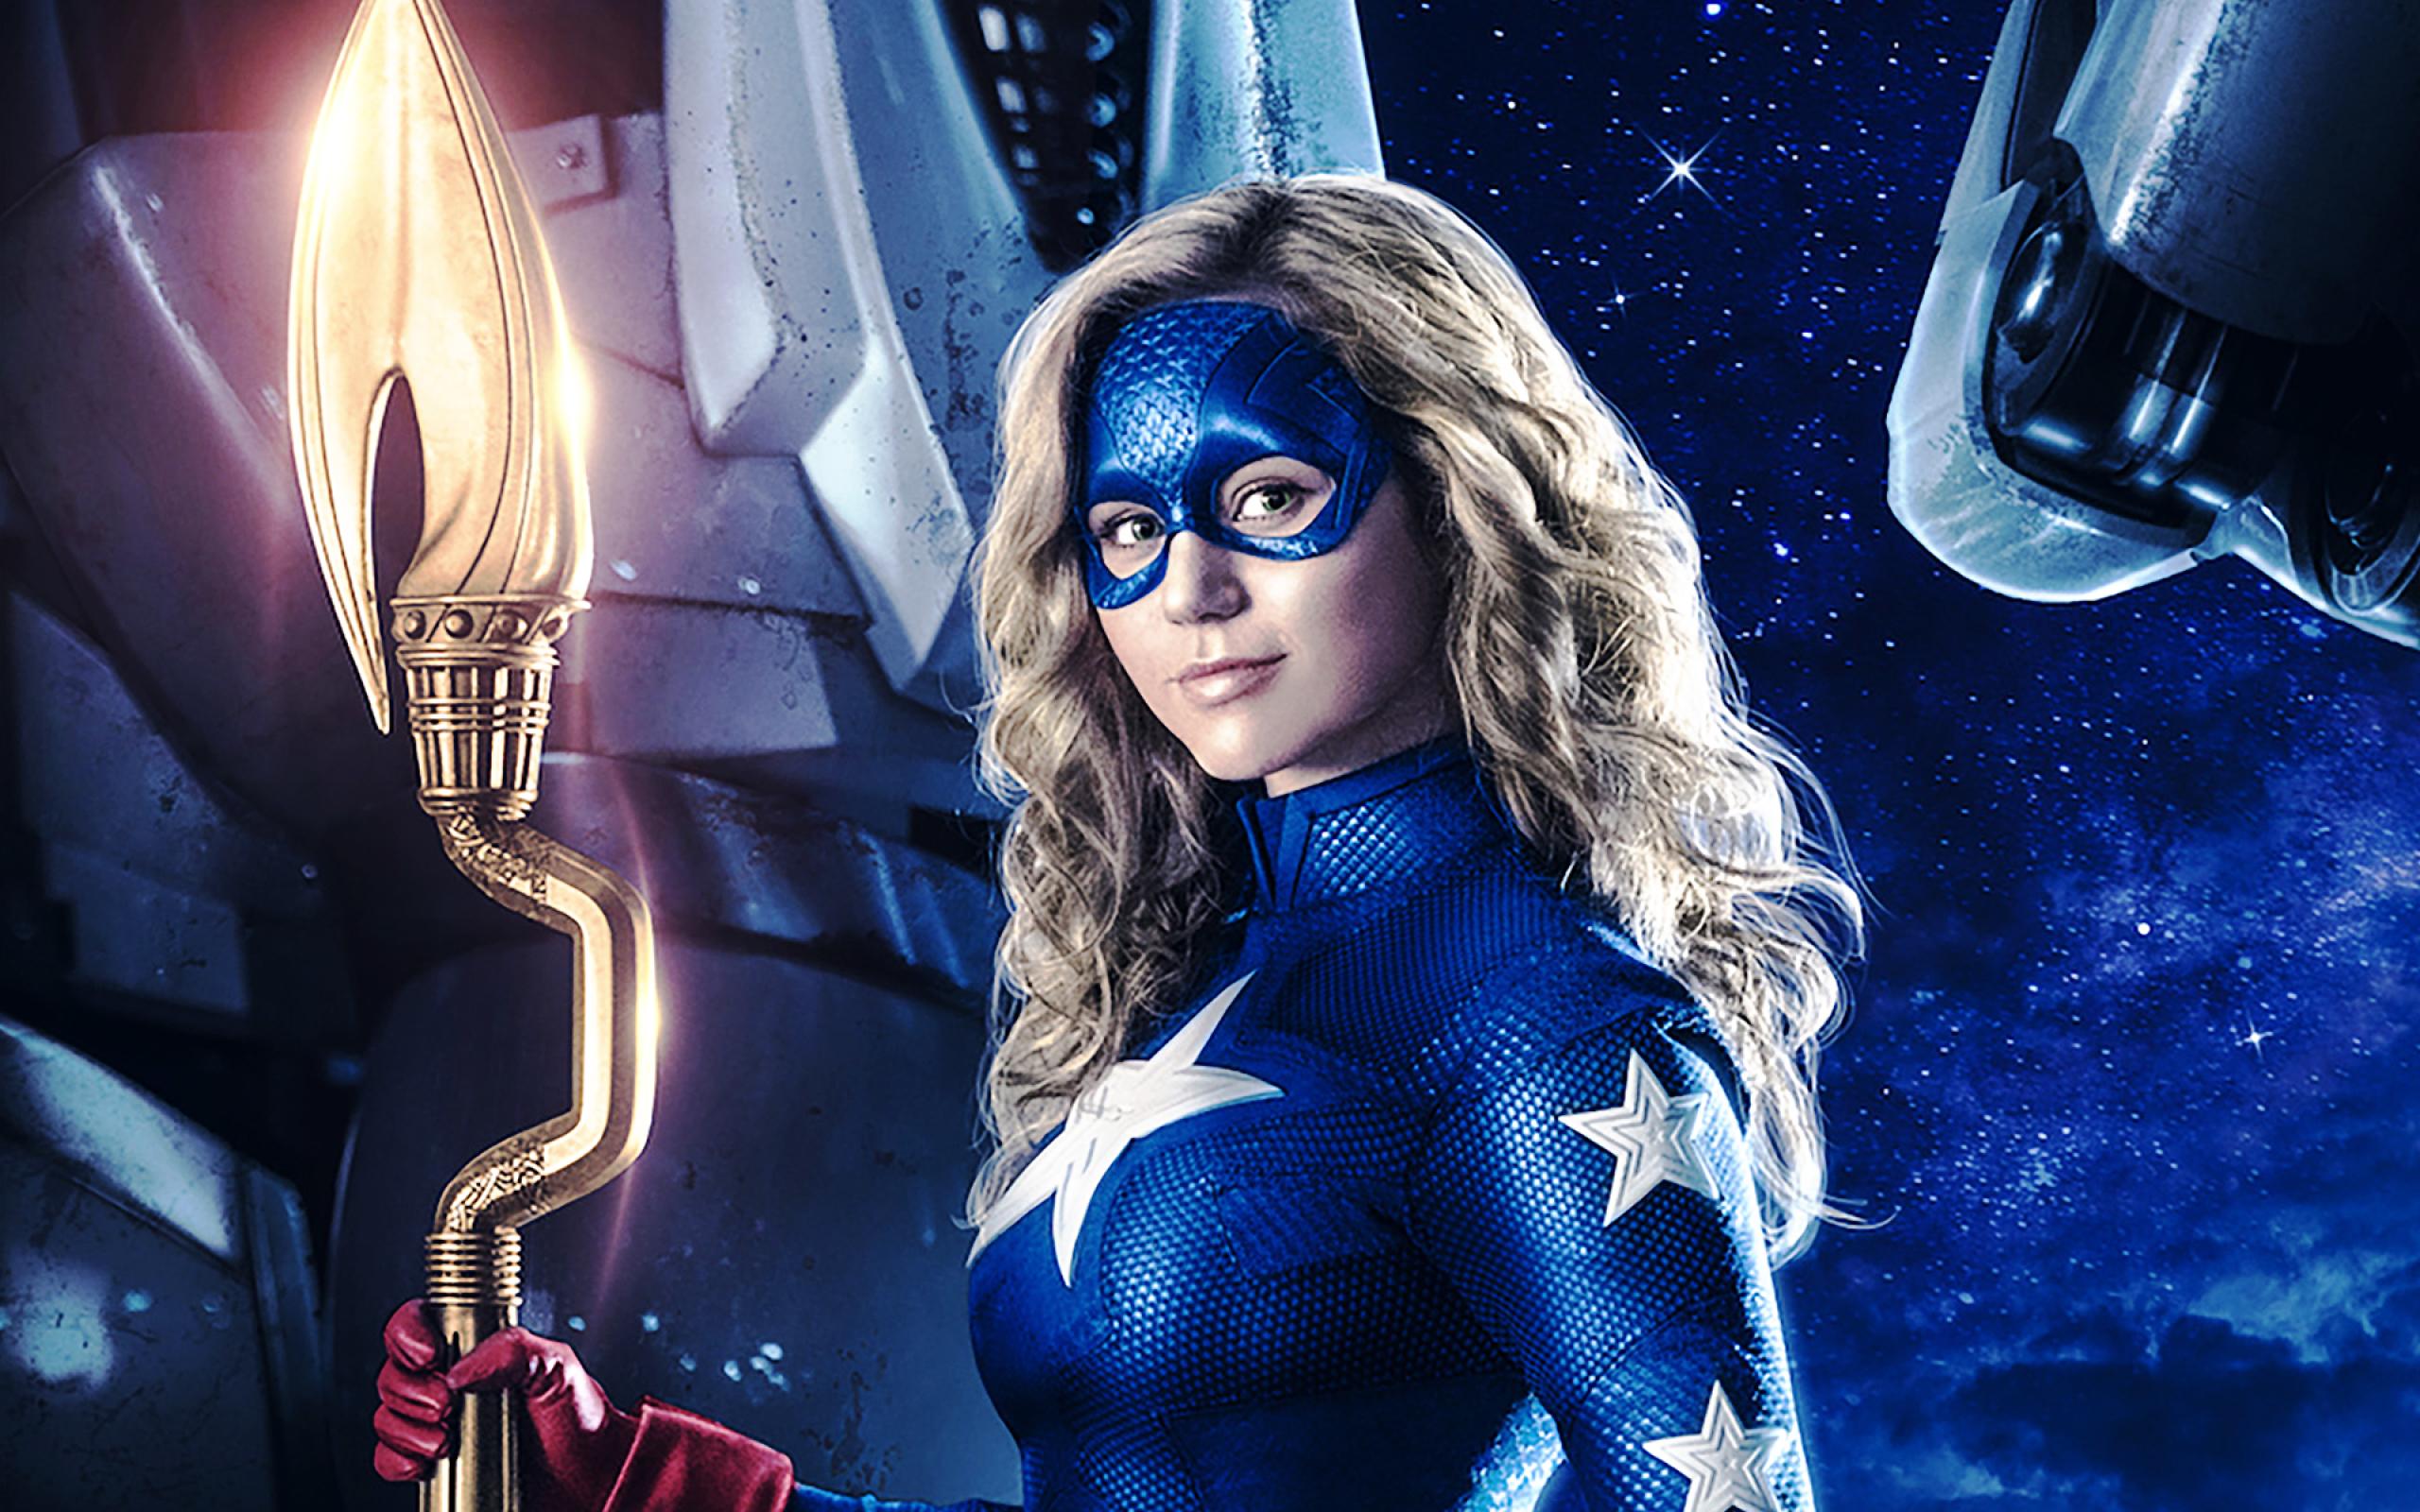 2560x1600 Stargirl DC Universe 2560x1600 Resolution Wallpaper HD 2560x1600